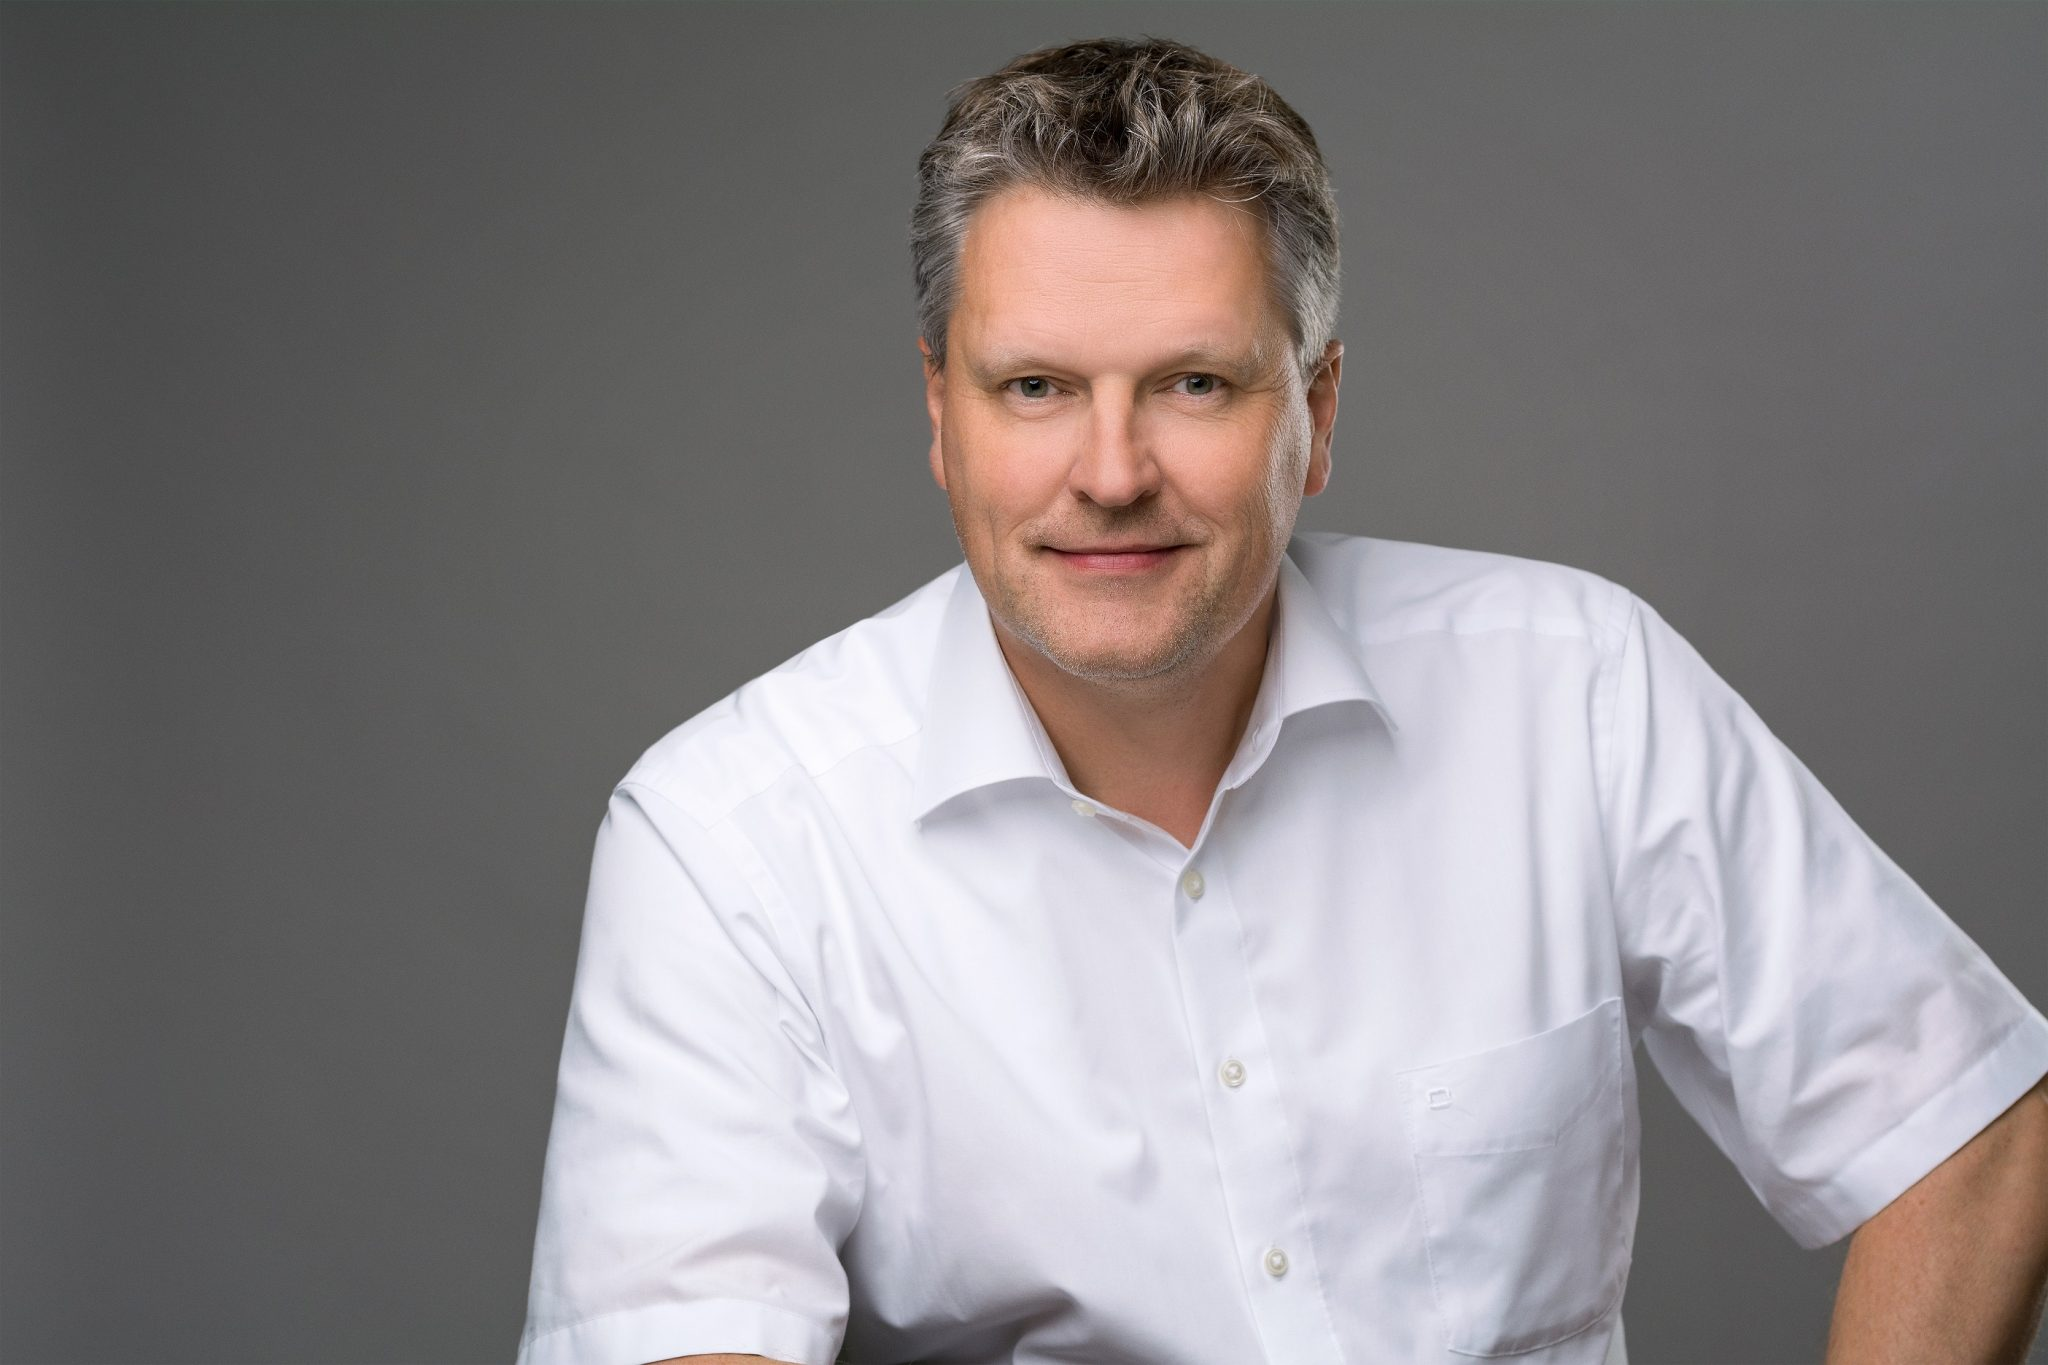 Dietmar Weiper